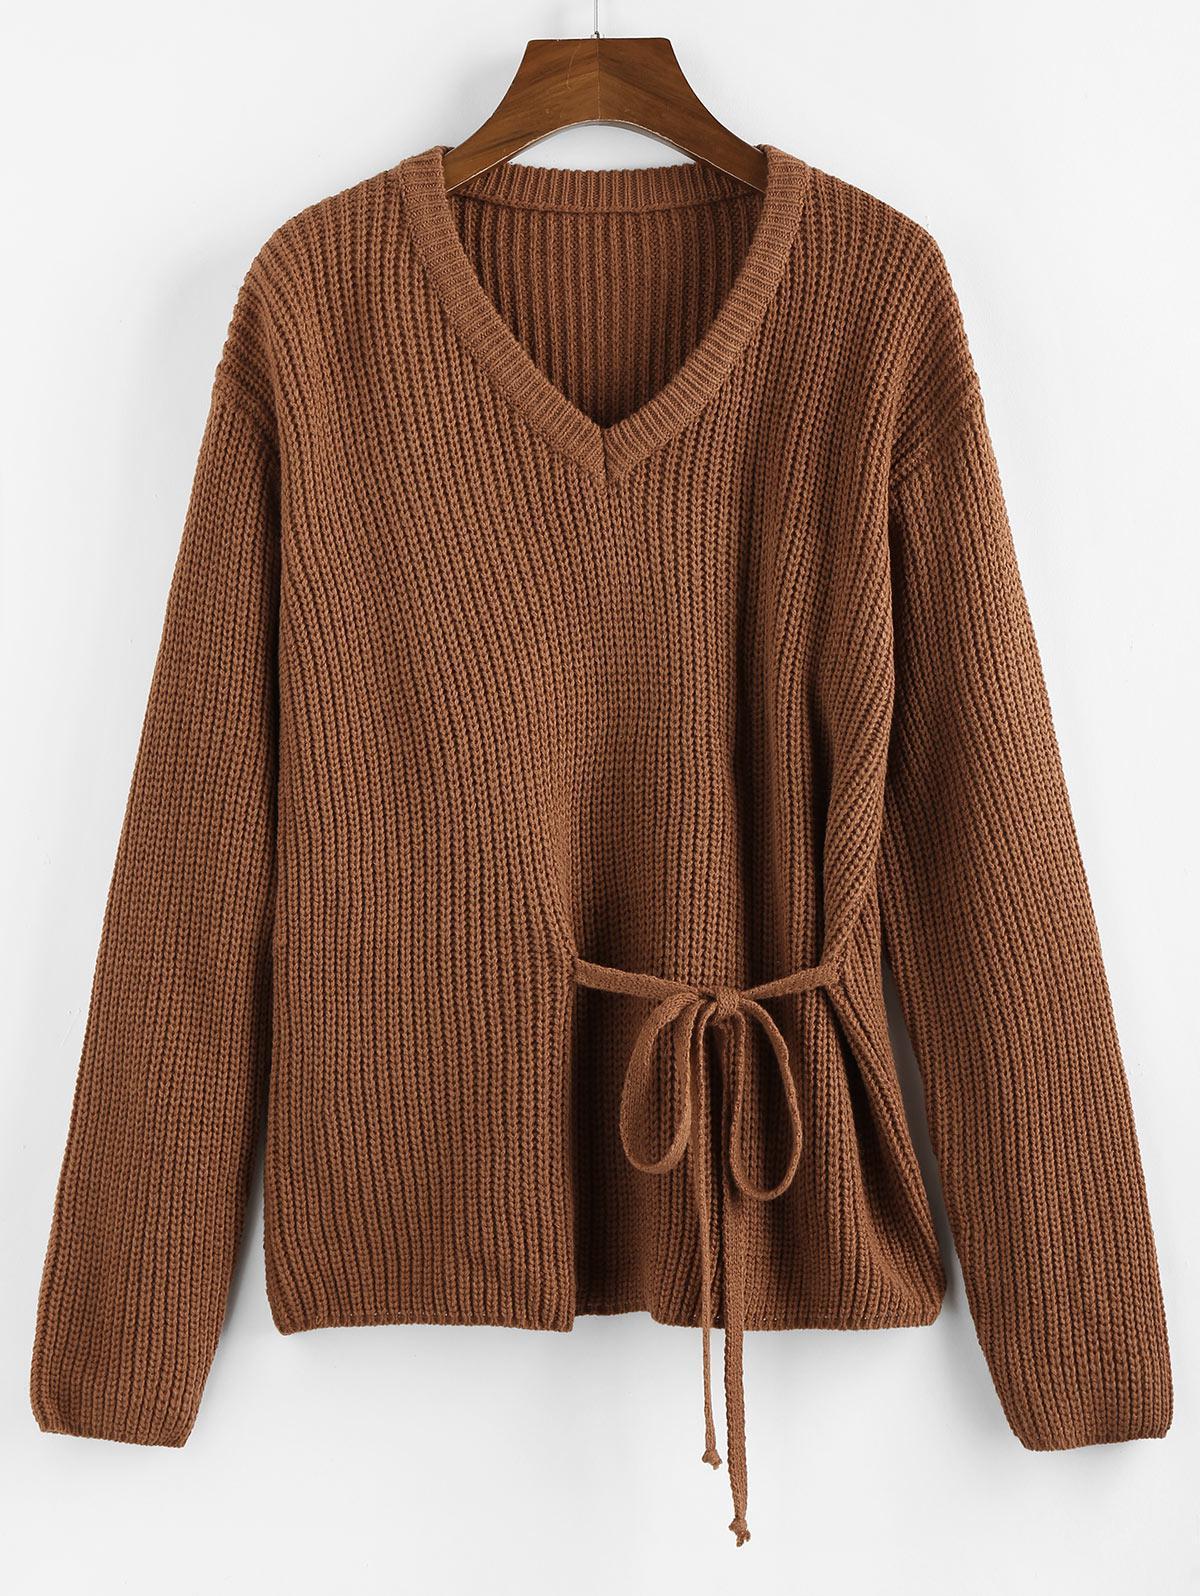 Zaful V Neck Ties Sweater